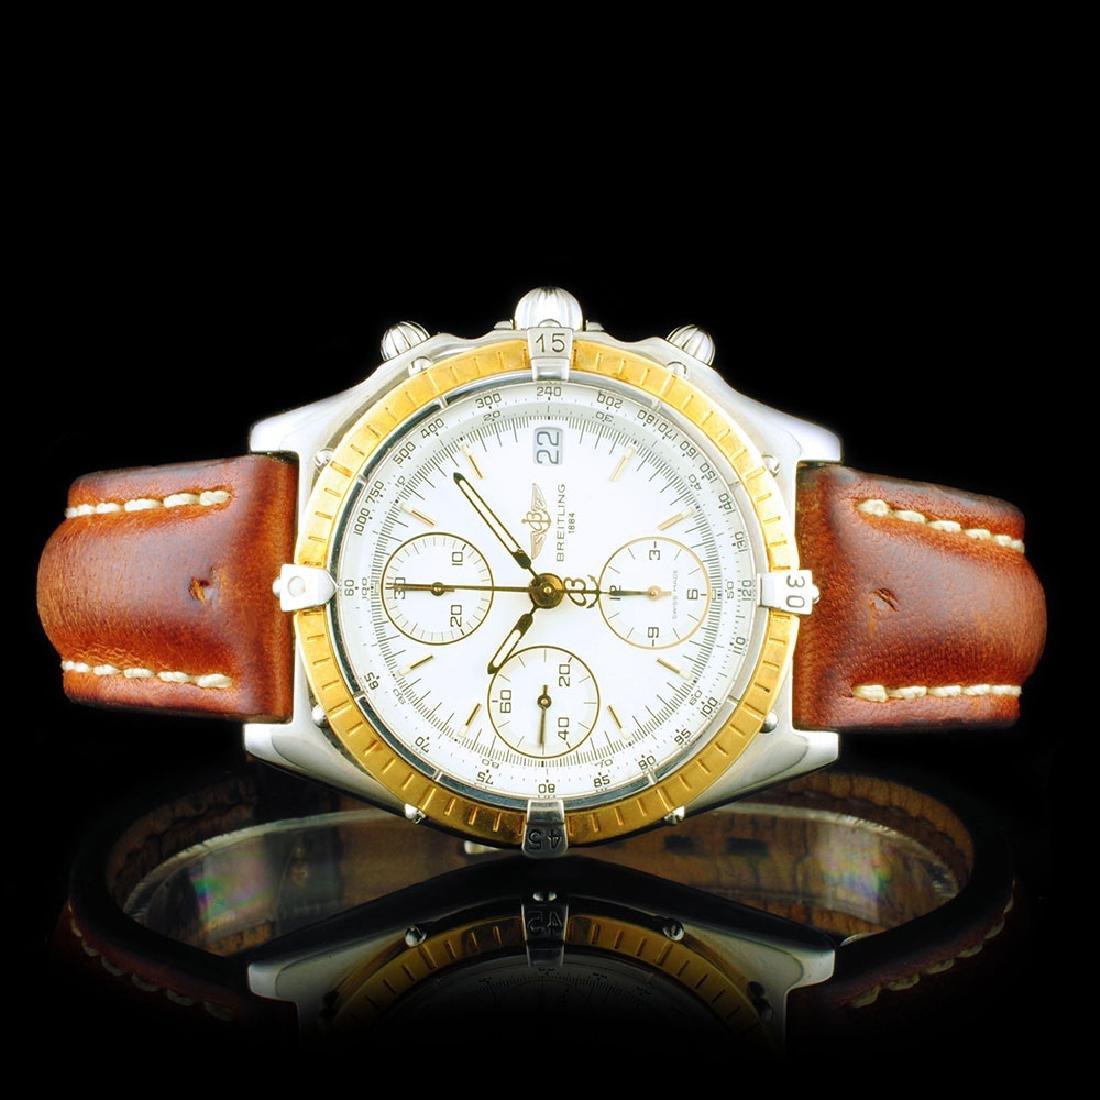 Breitling Chronomat Chrono Gold/SS 40mm Watch